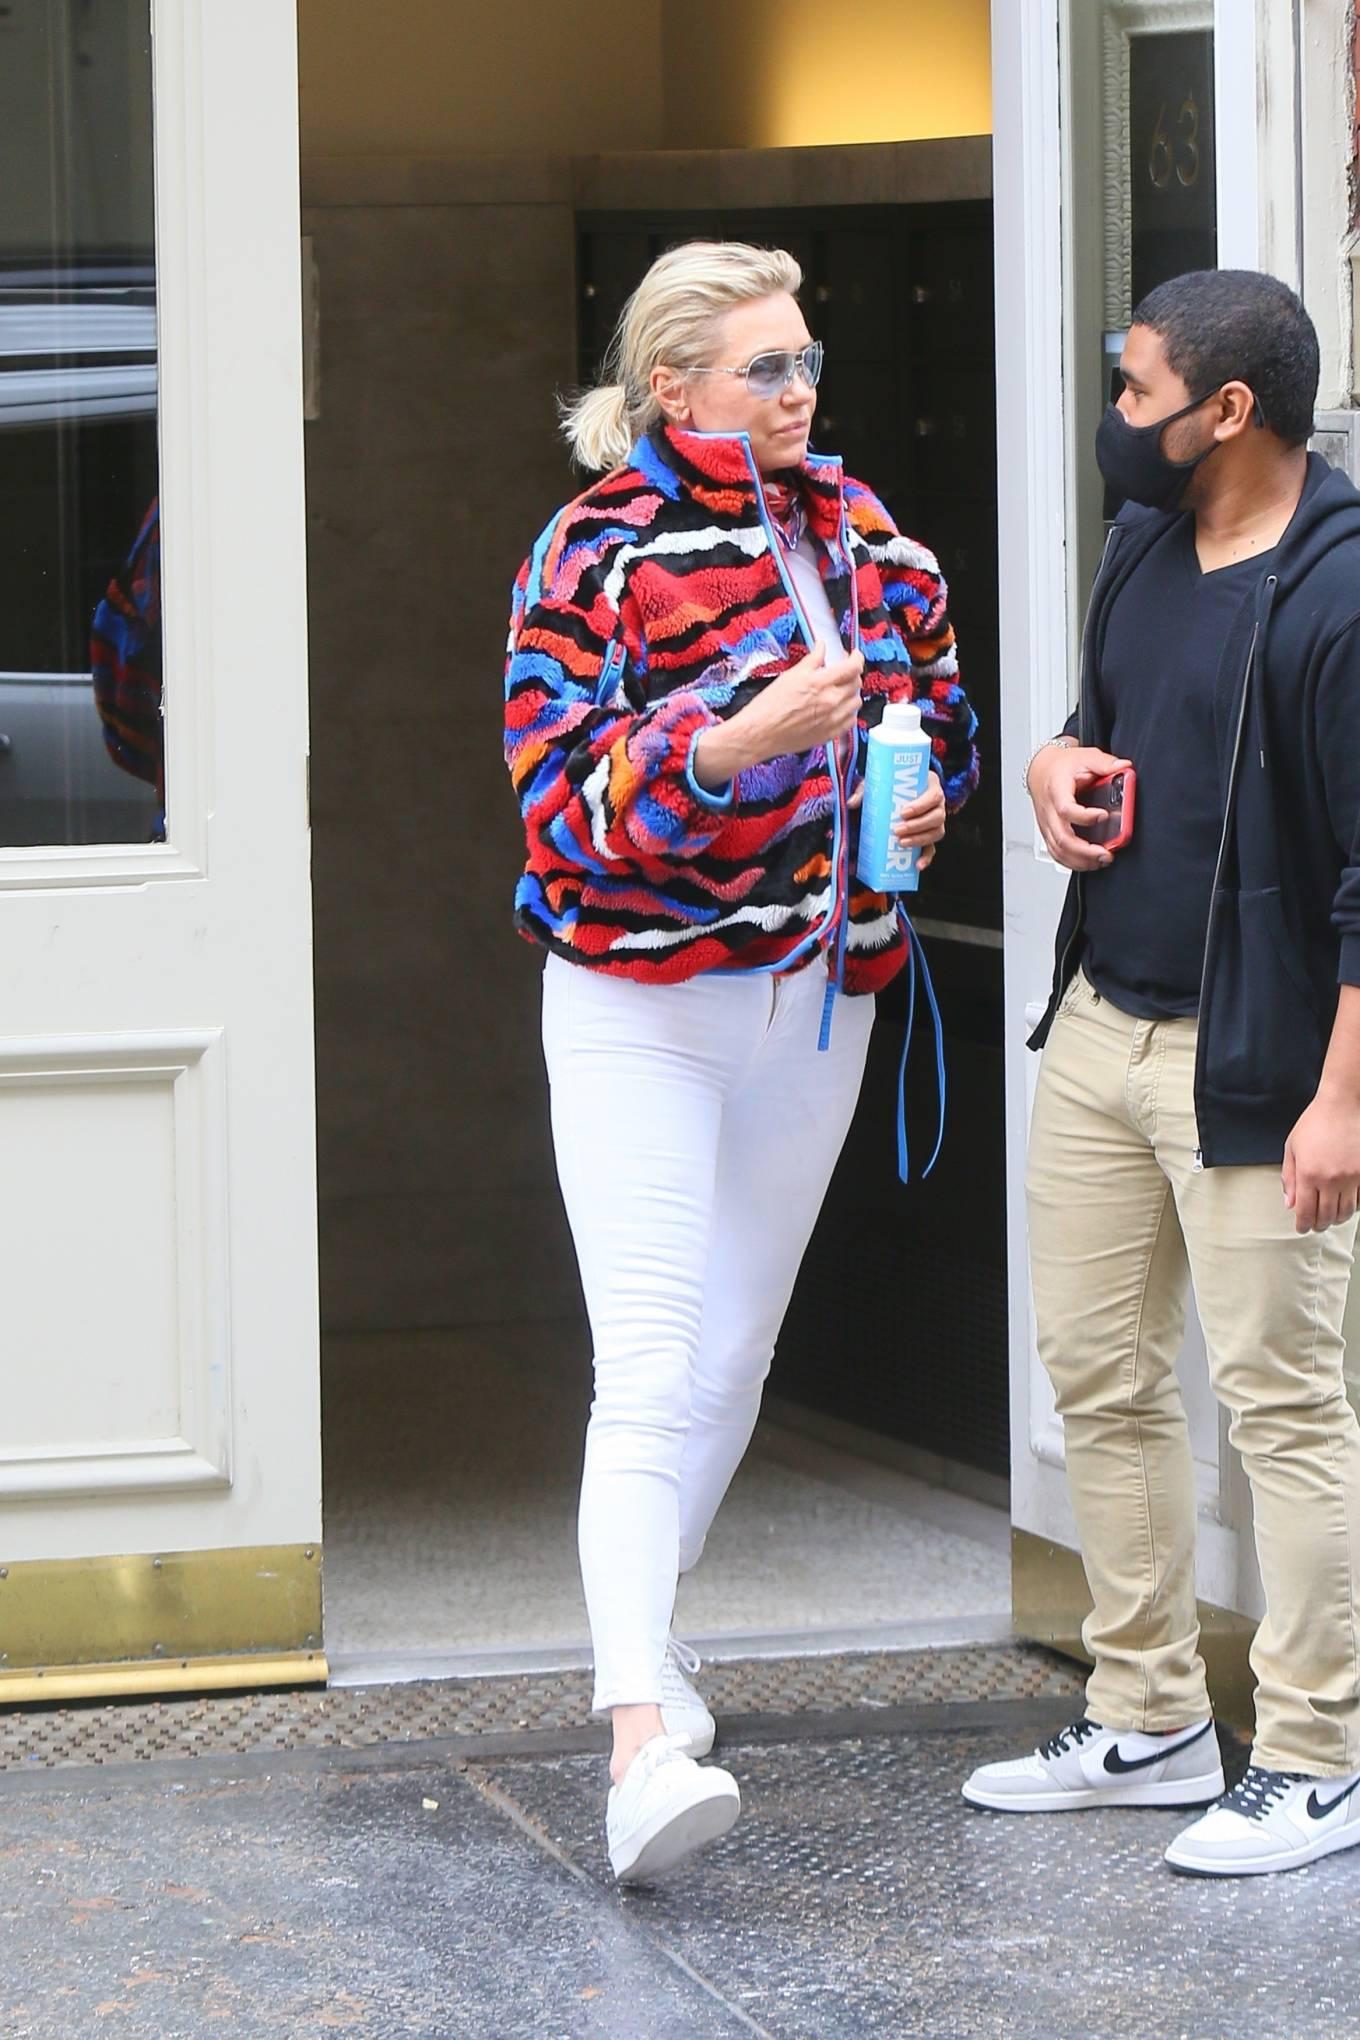 Yolanda Hadid 2021 : Yolanda Hadid – Seen as she visits daughter Bellas apartment in New York-07